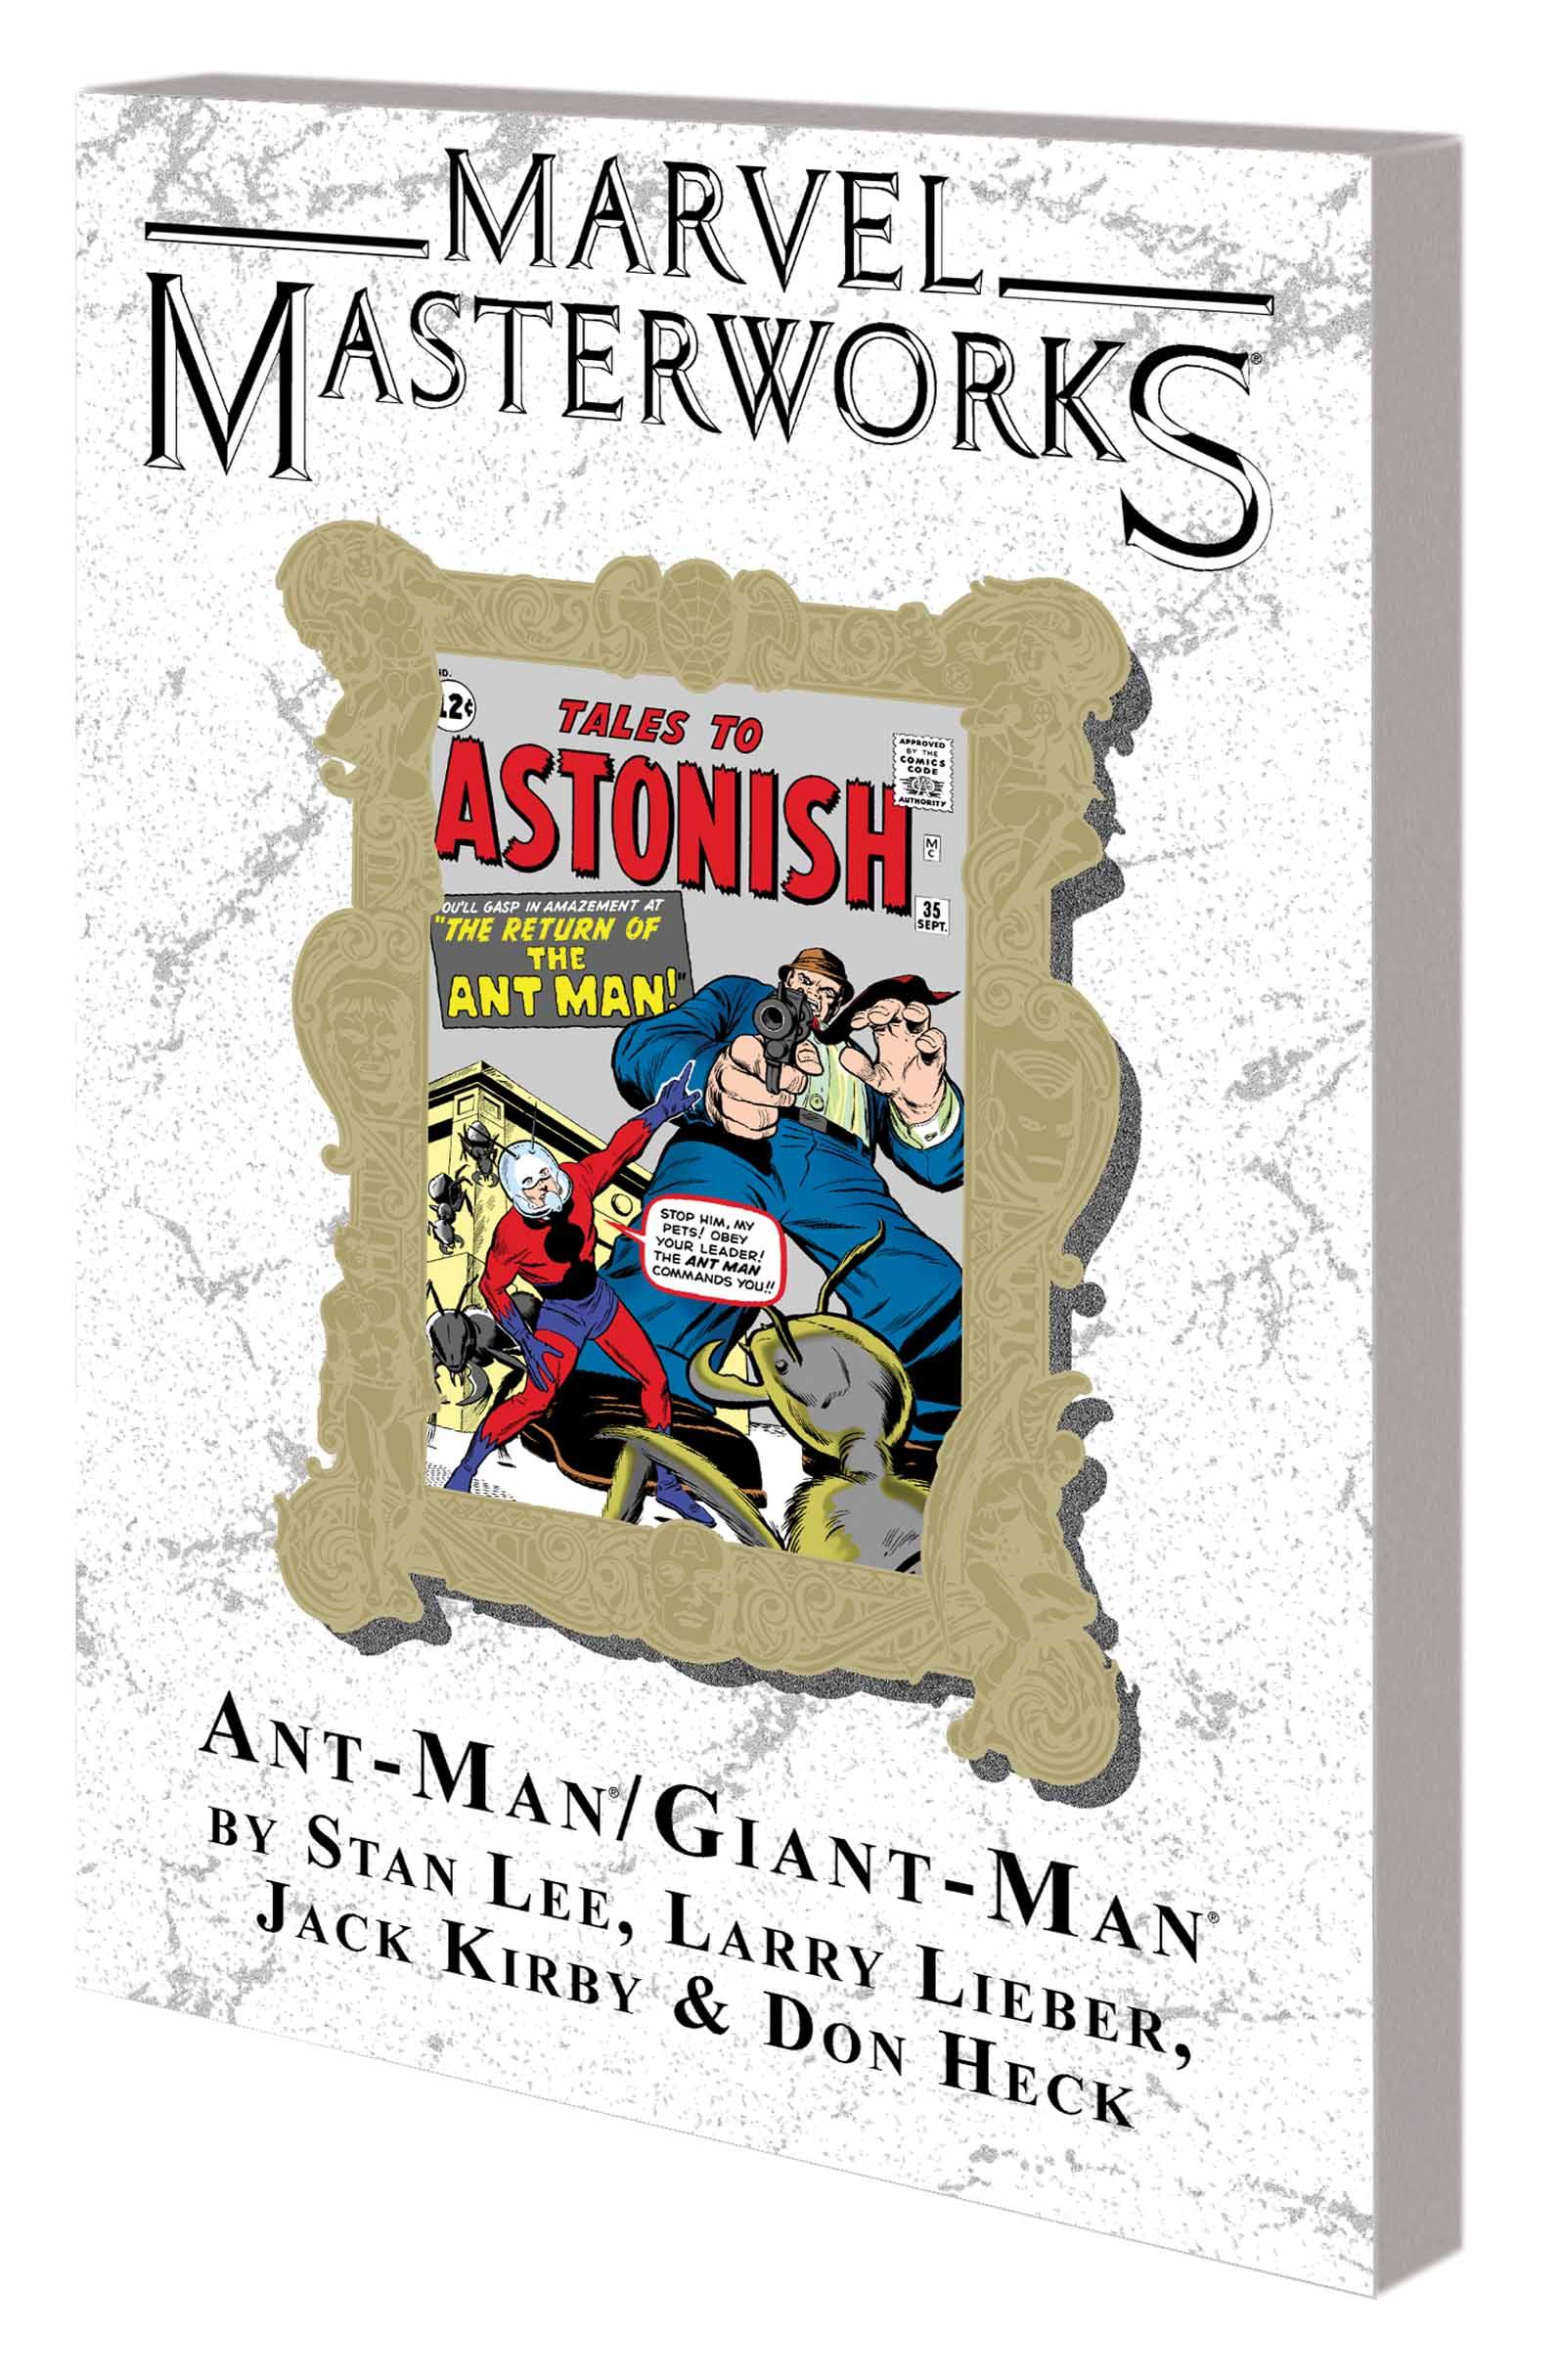 Marvel Masterworks: Ant-Man/Giant-Man (Trade Paperback)